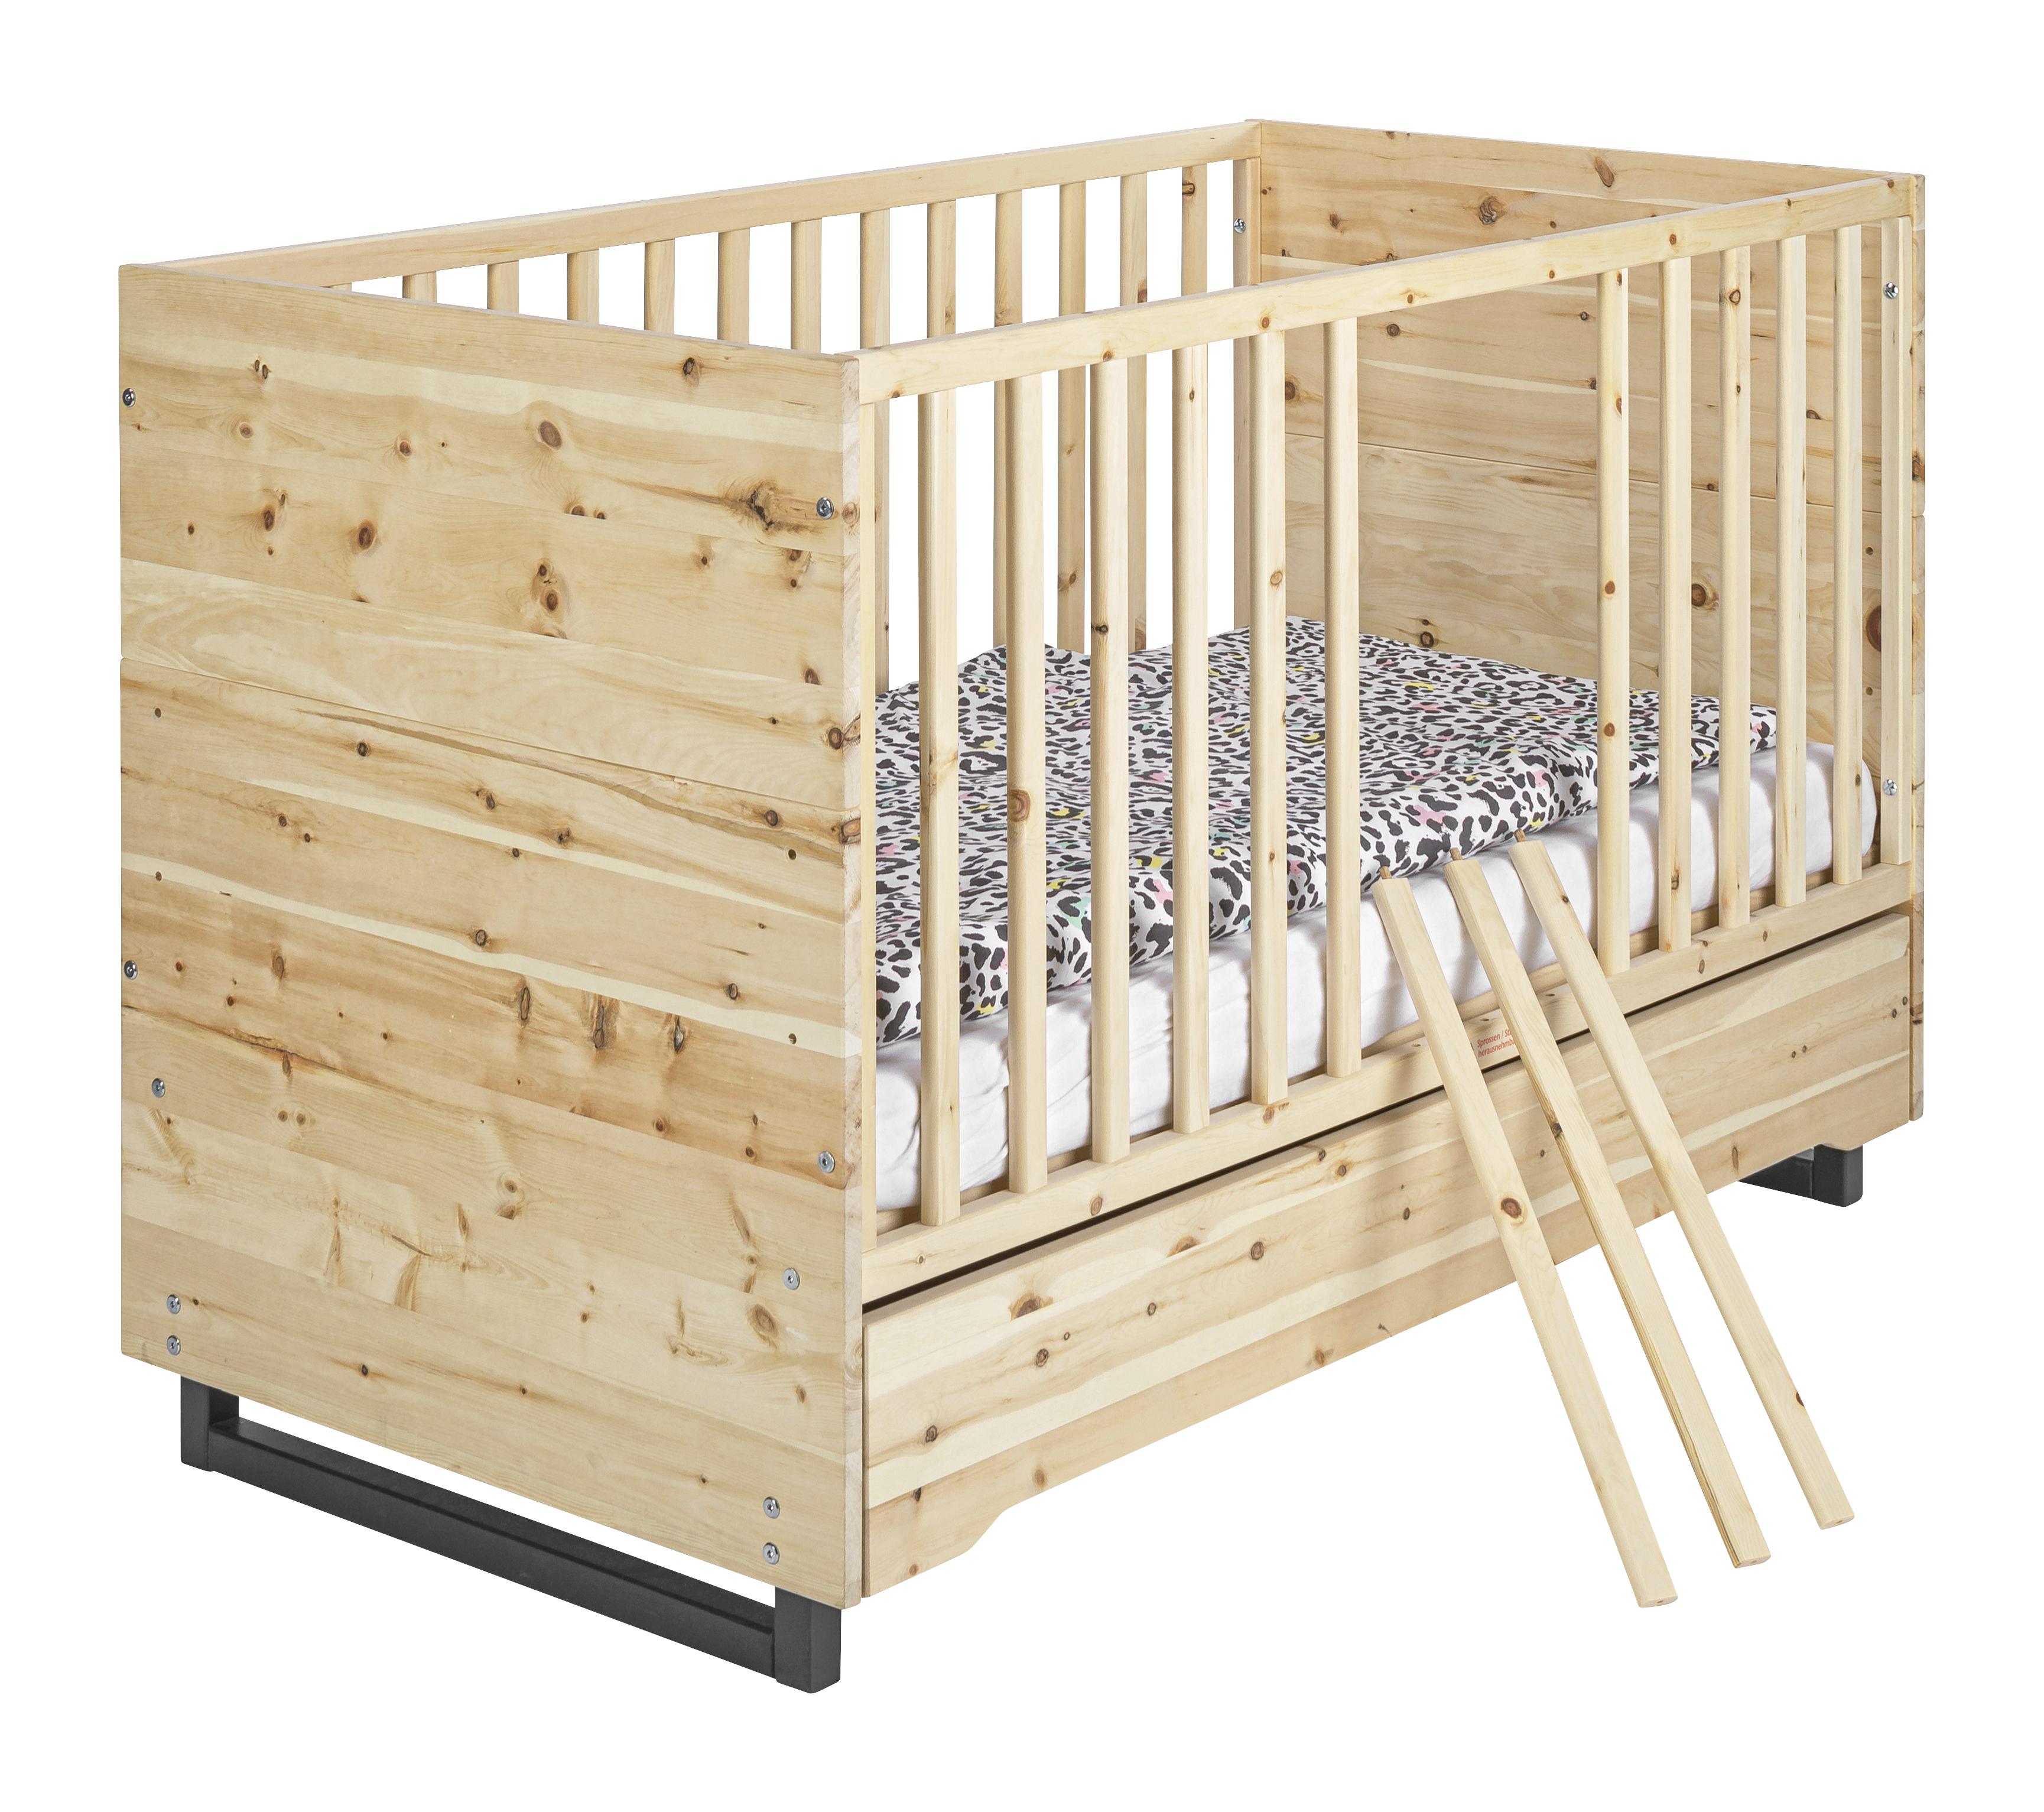 04-261-20-00-Zirbe-Natur_Kombi-Kinderbett-70x140-cm__3